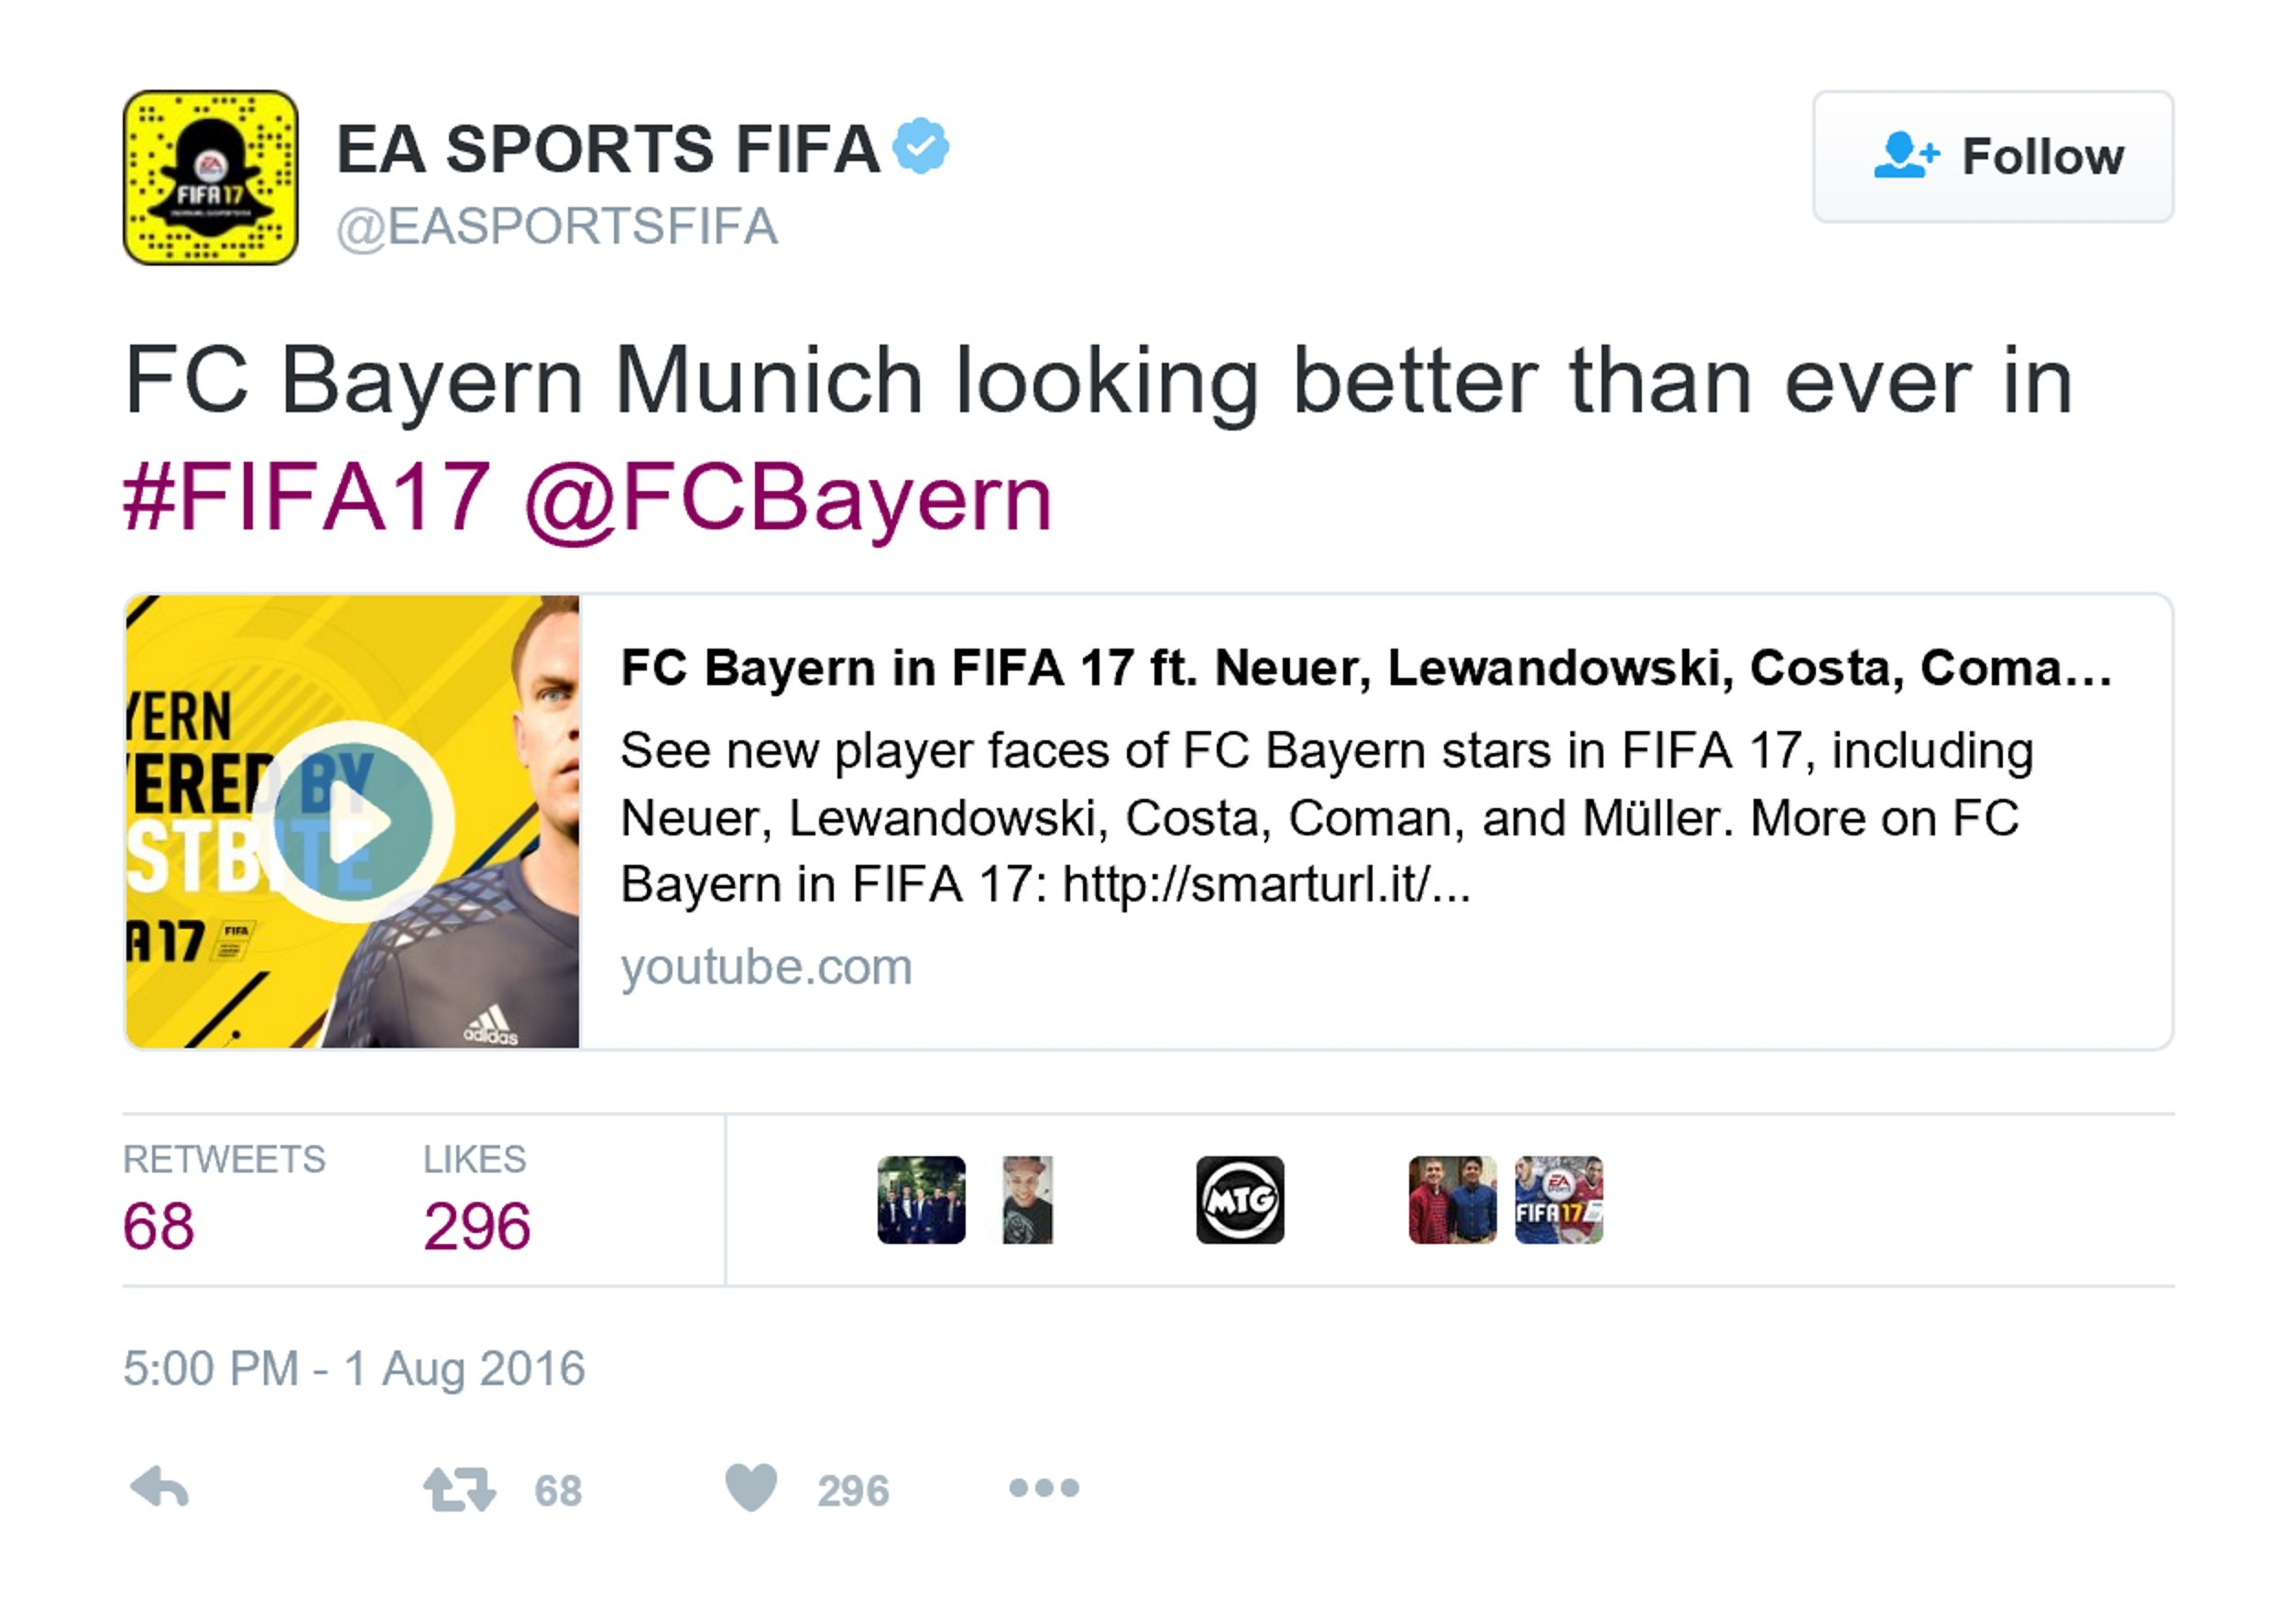 《FIFA 17》拜仁慕尼黑宣传片